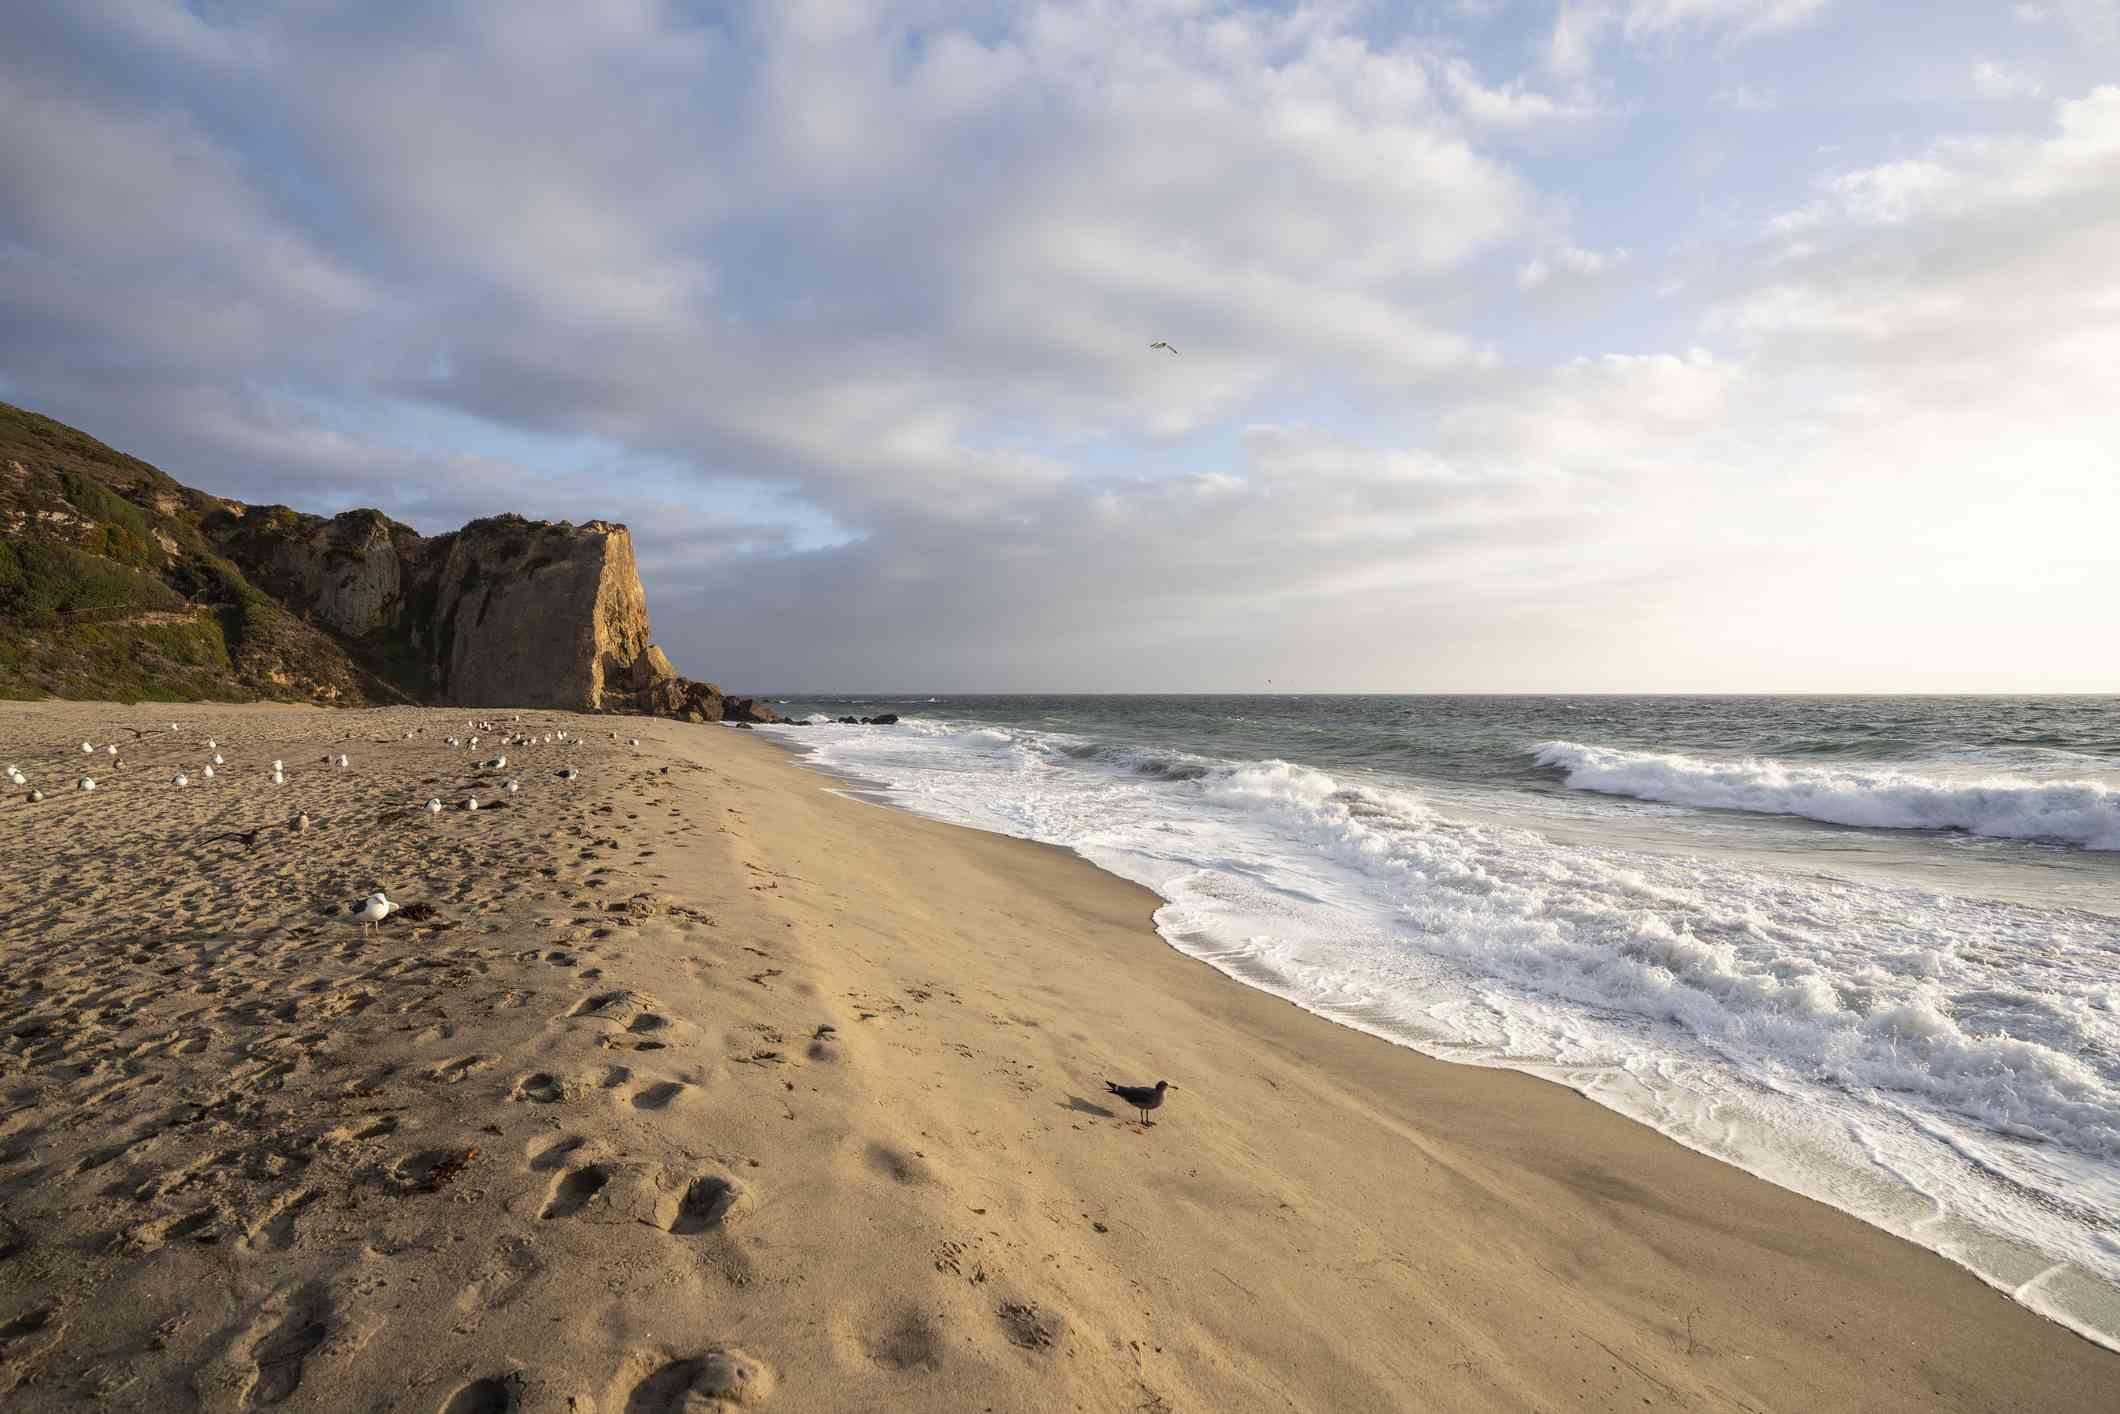 Point Dume Cliff at Westward Beach in Malibú California